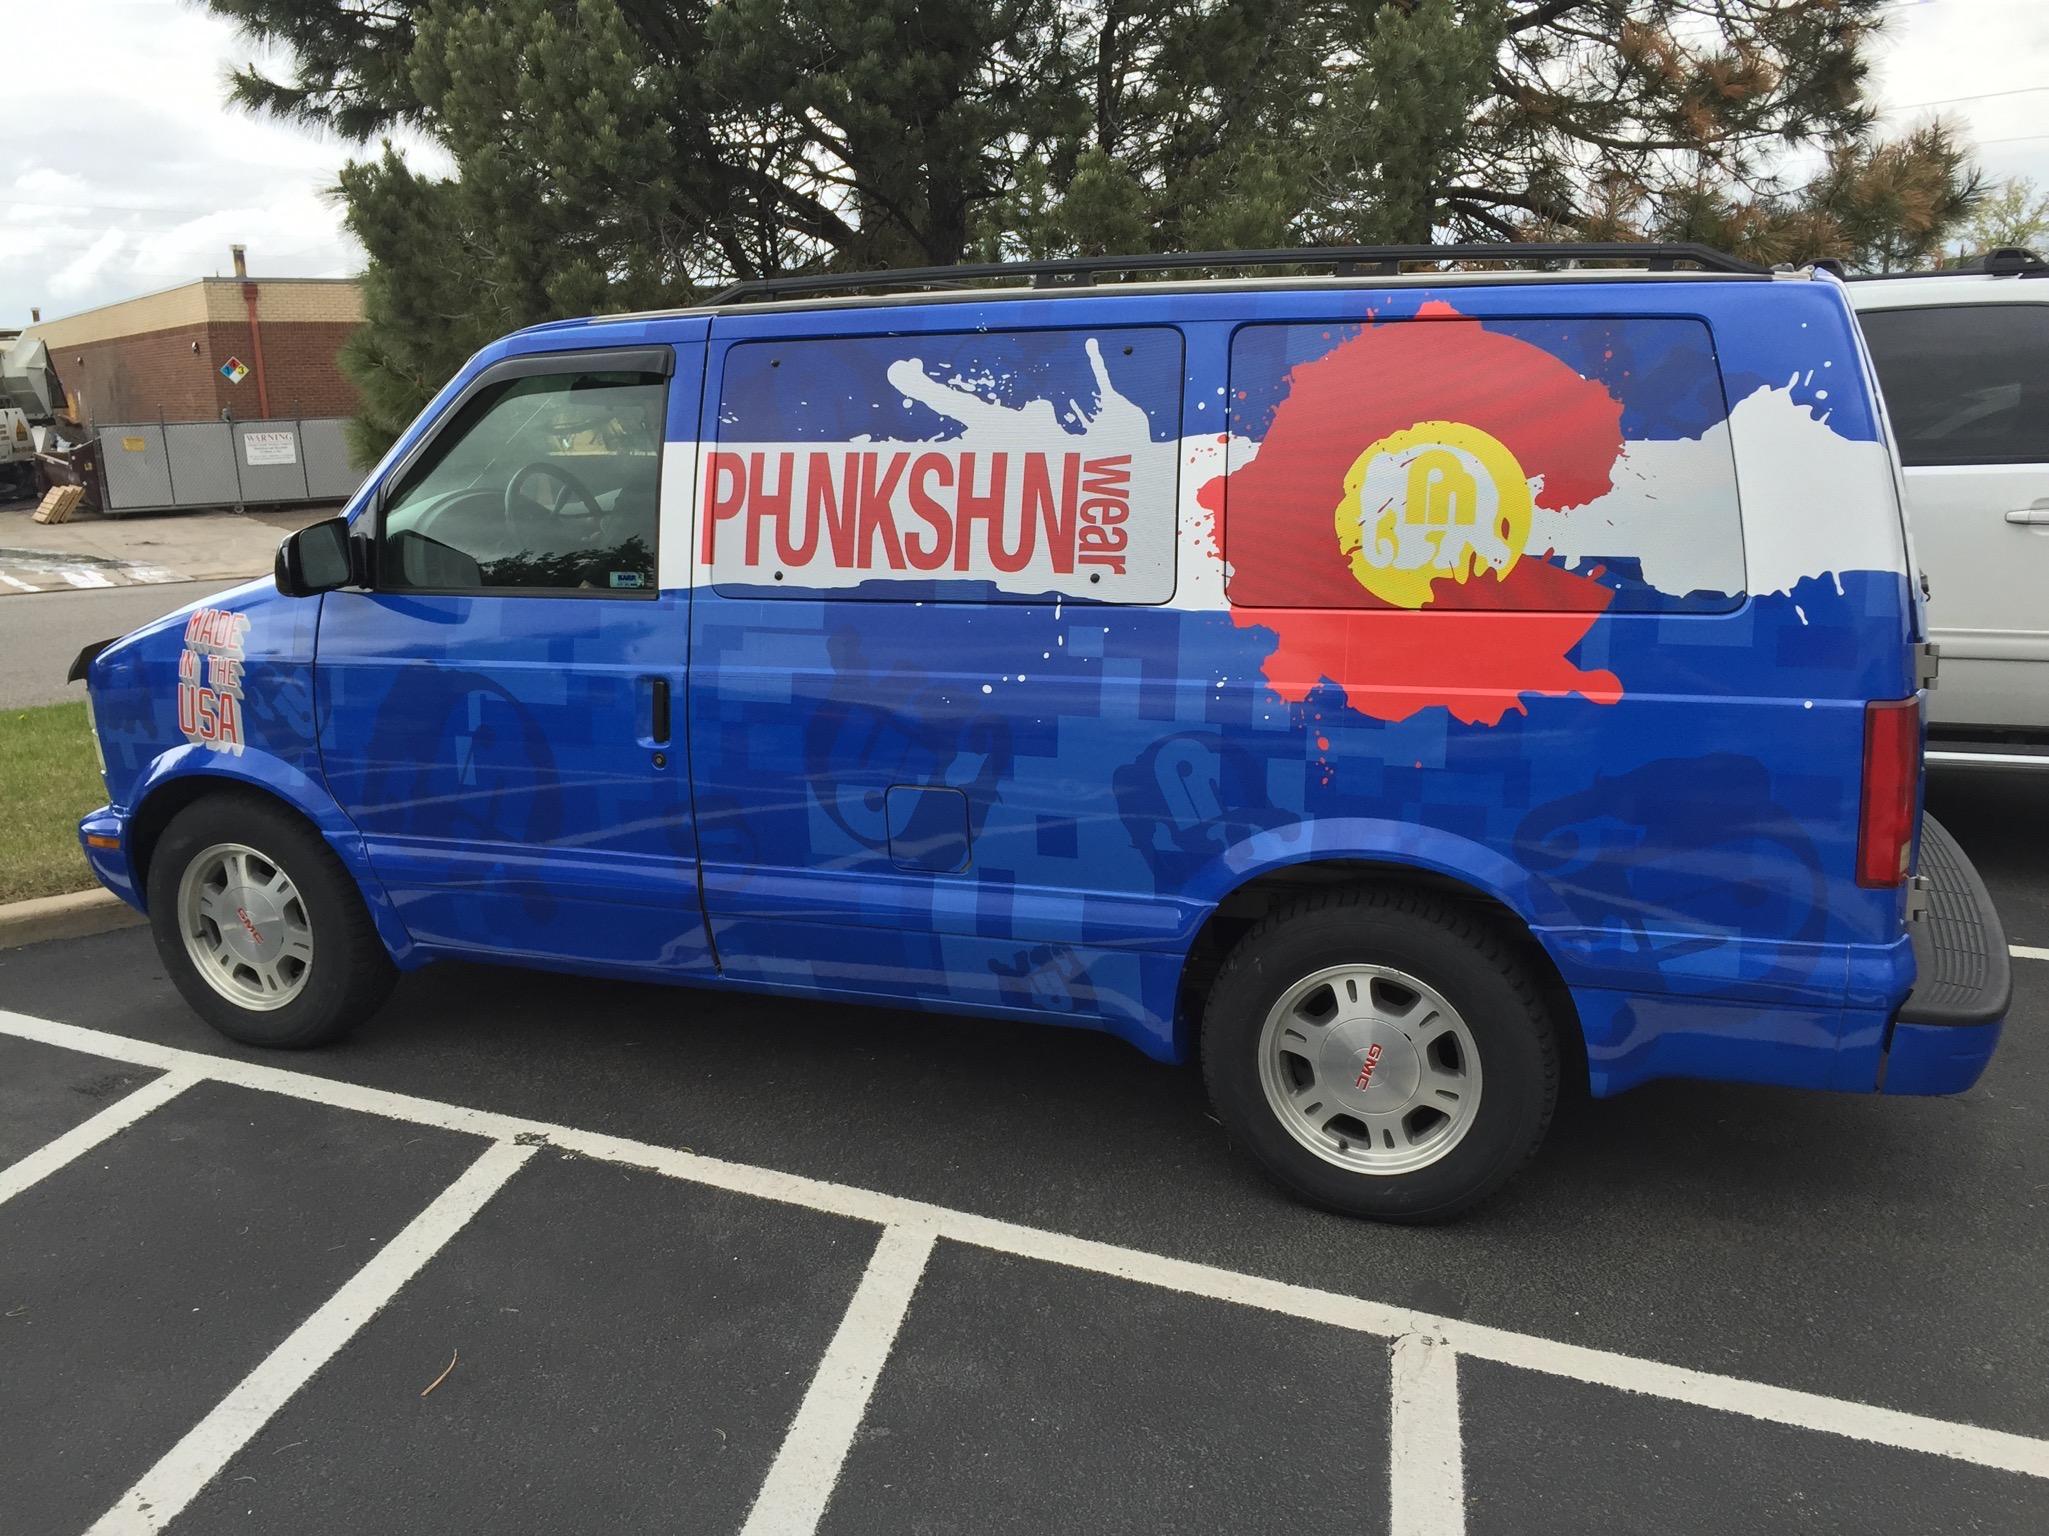 Phunkshun Wear - Fleet Wrap